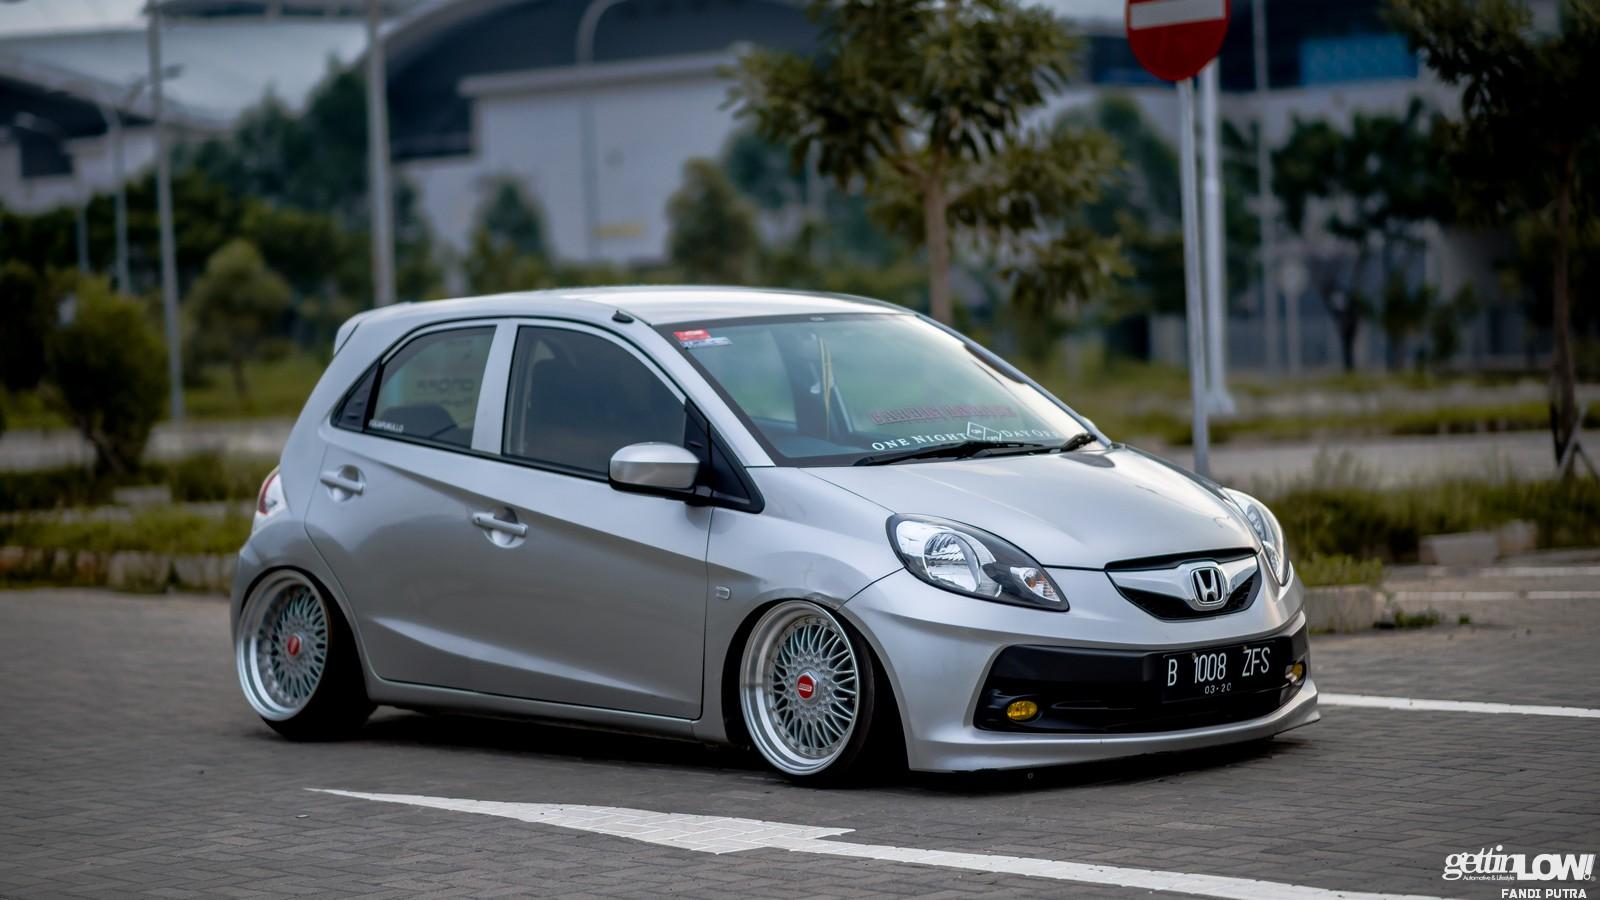 Fajri Alfiandi: 2014 Honda Brio